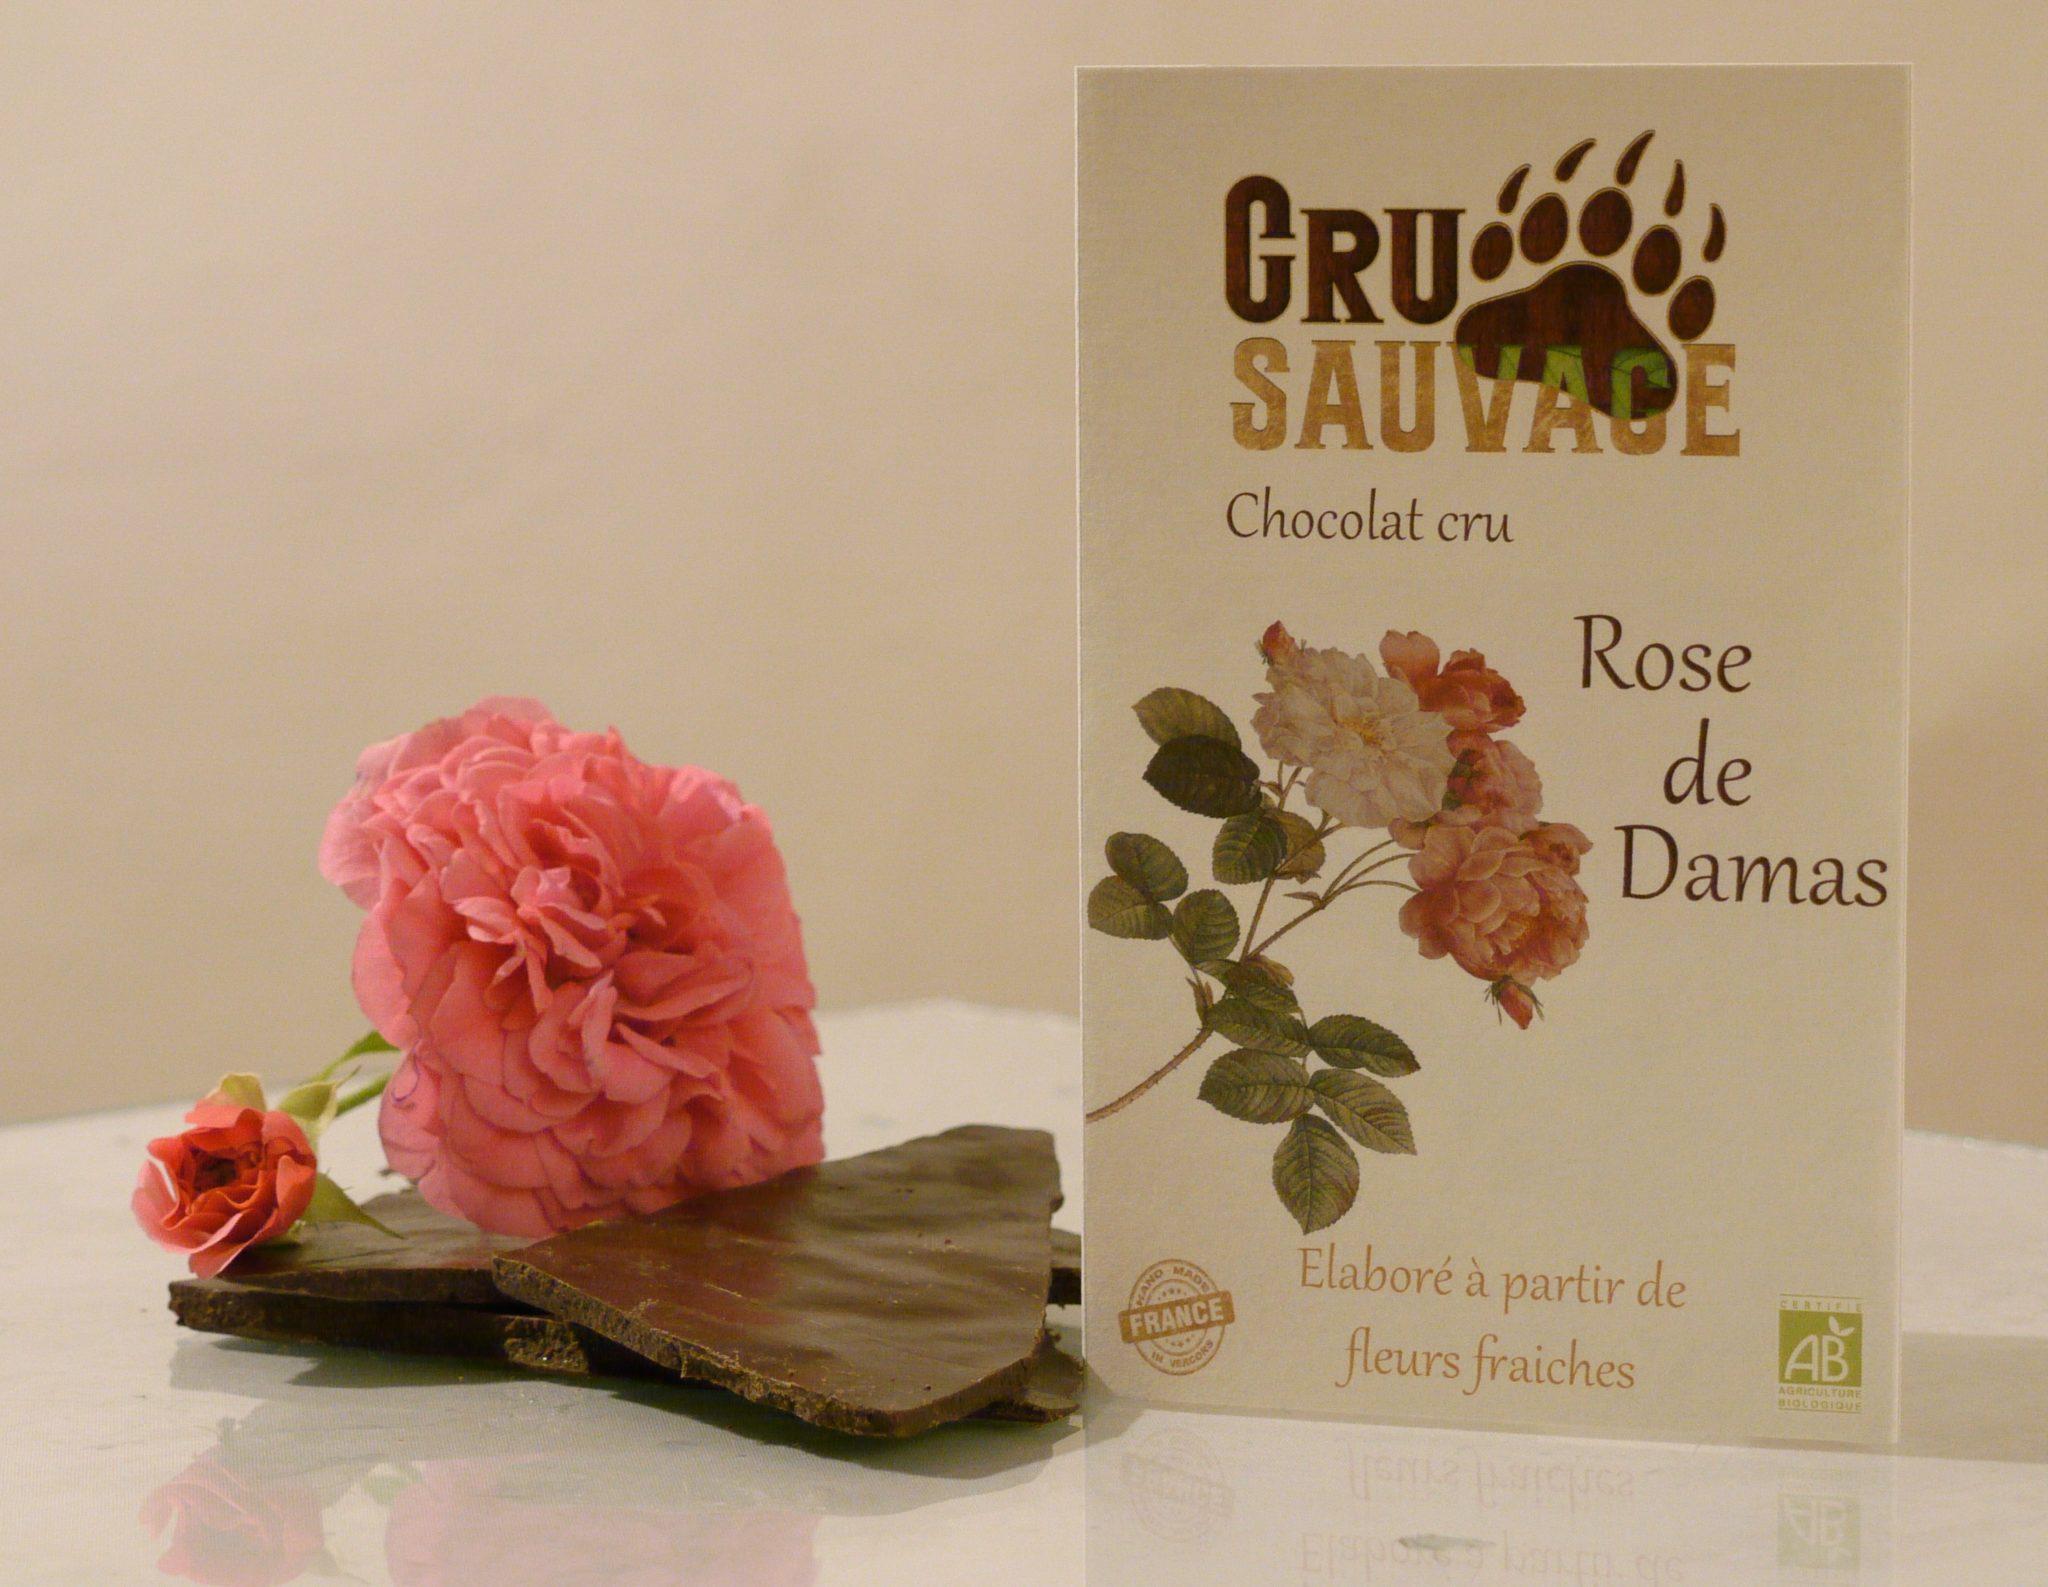 'cru sauvage' Rohschokolade Damaskus Rose